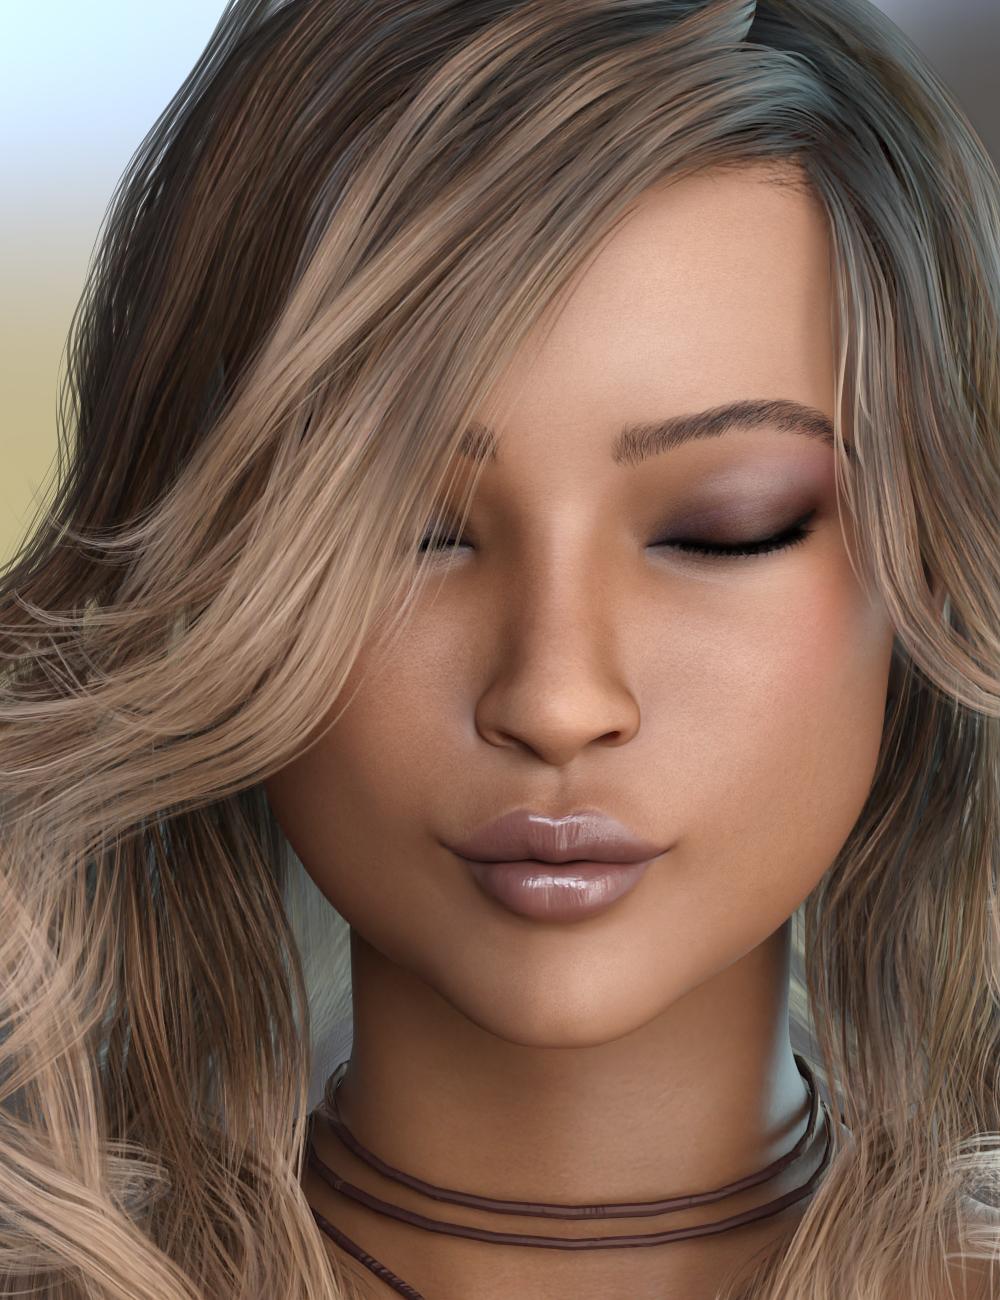 Janette for Teen Jane 8 by: 3DSublimeProductionsVex, 3D Models by Daz 3D